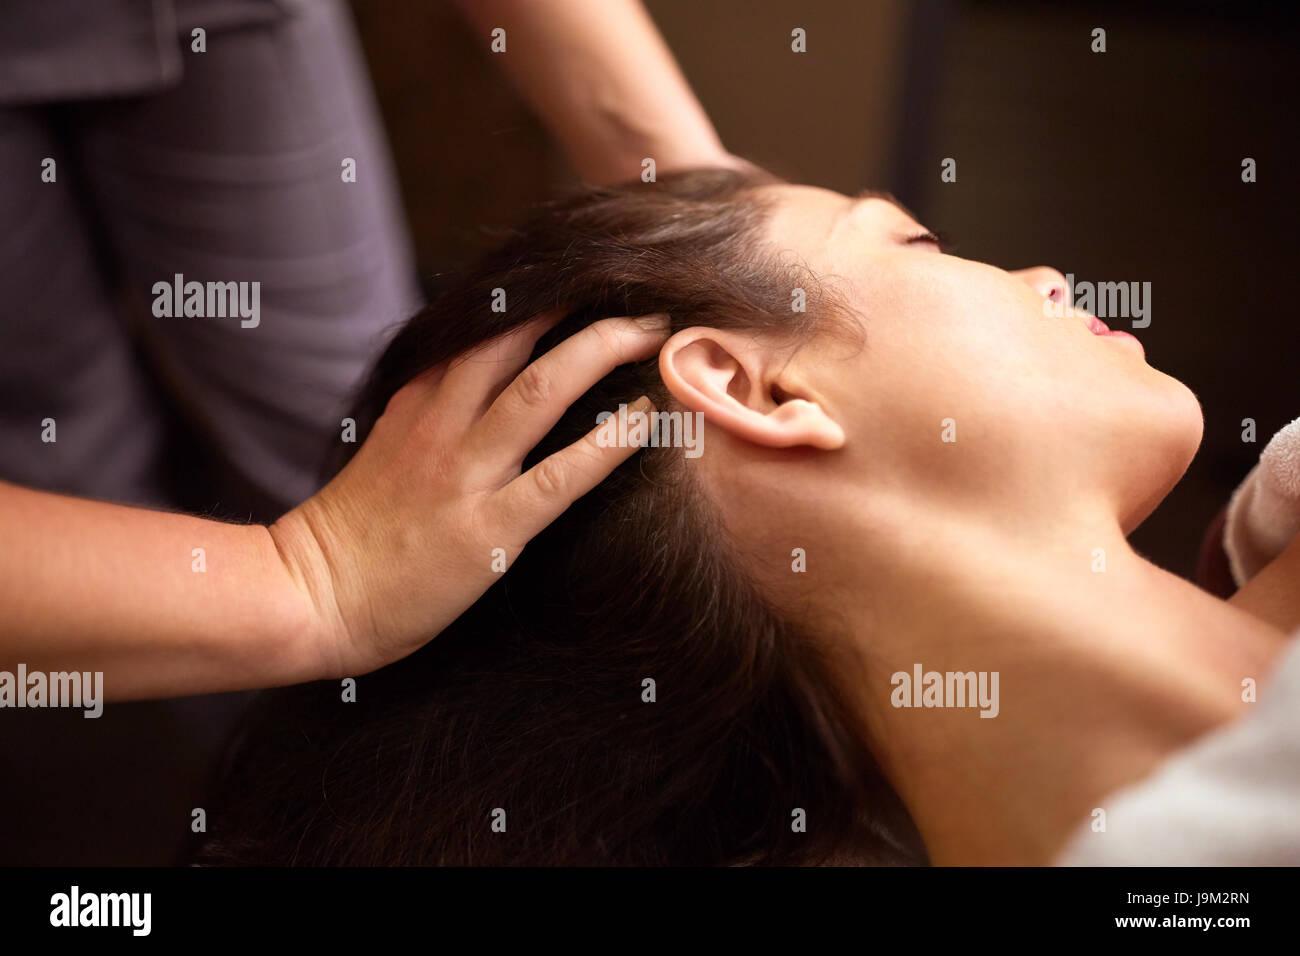 woman having head massage at spa - Stock Image